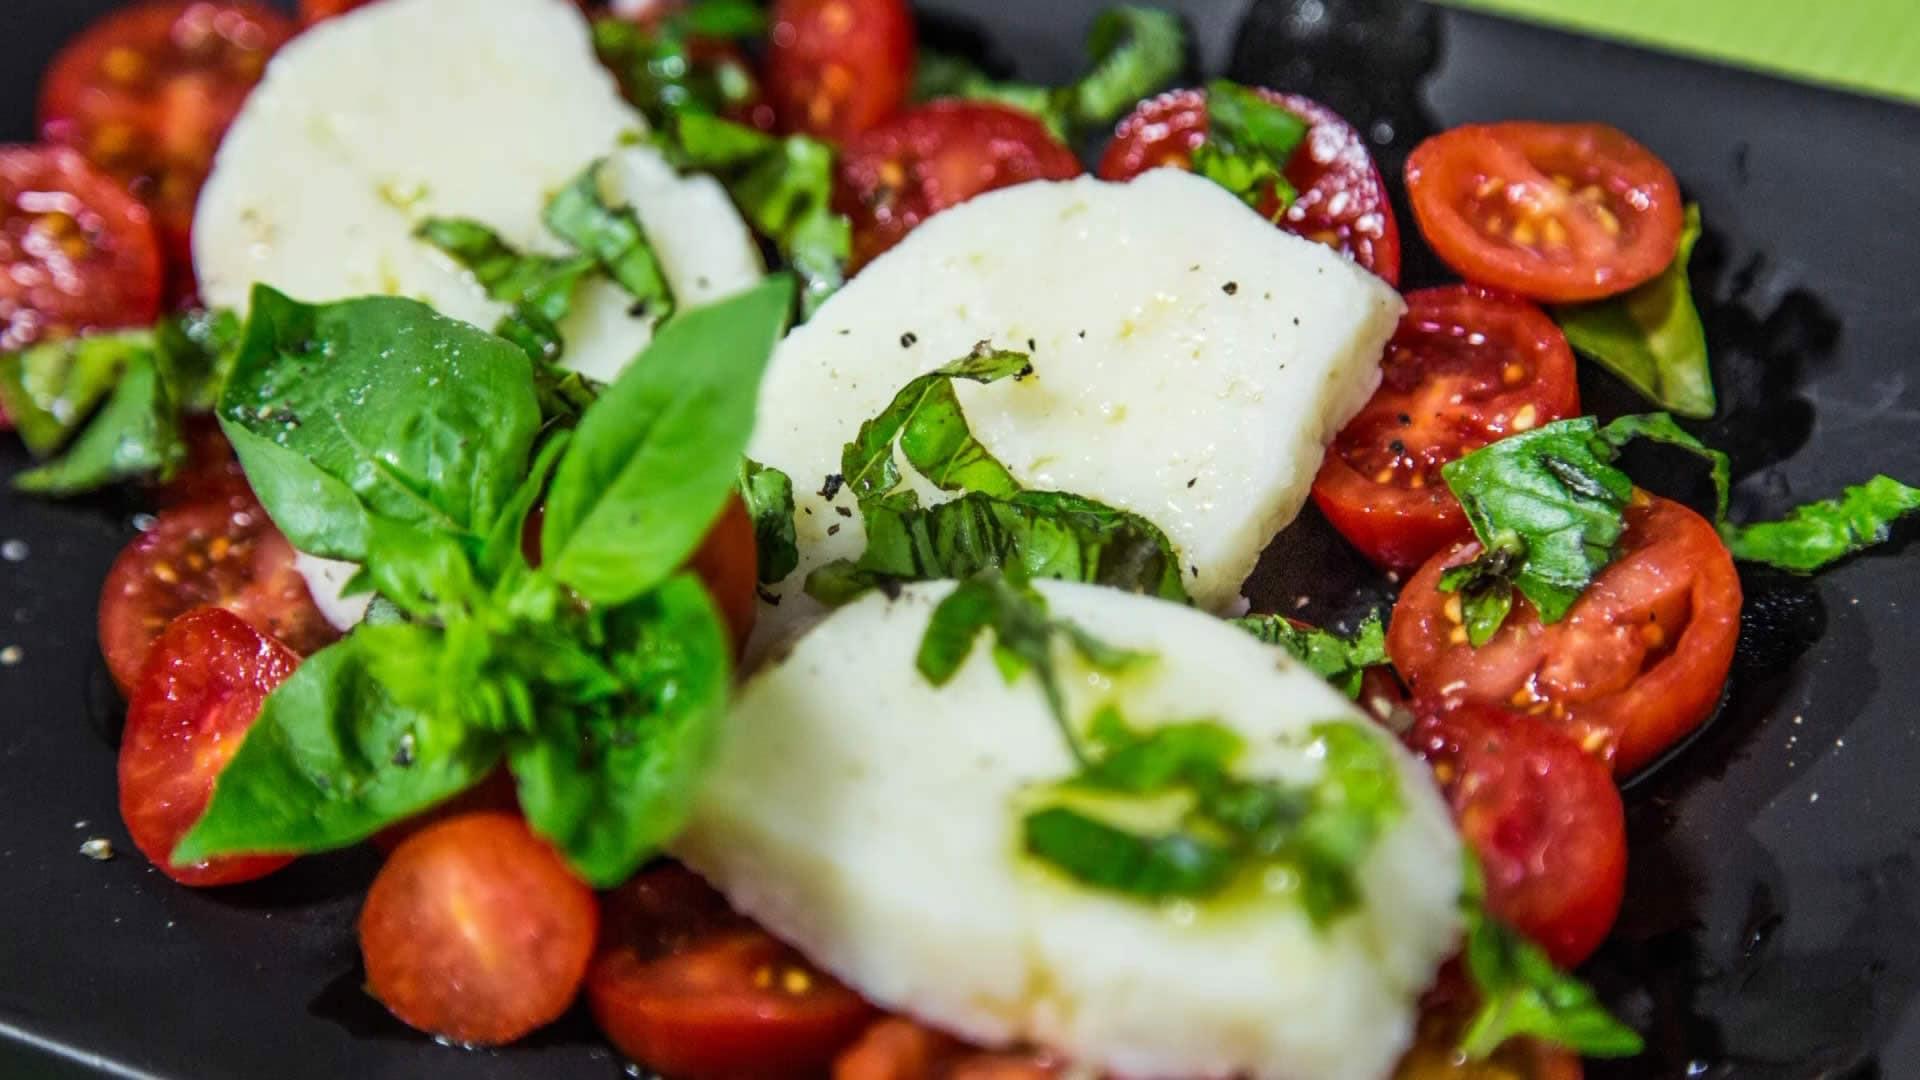 Foto Mozzarella Vegana - Mozzarella Vegetale Senza Colesterolo